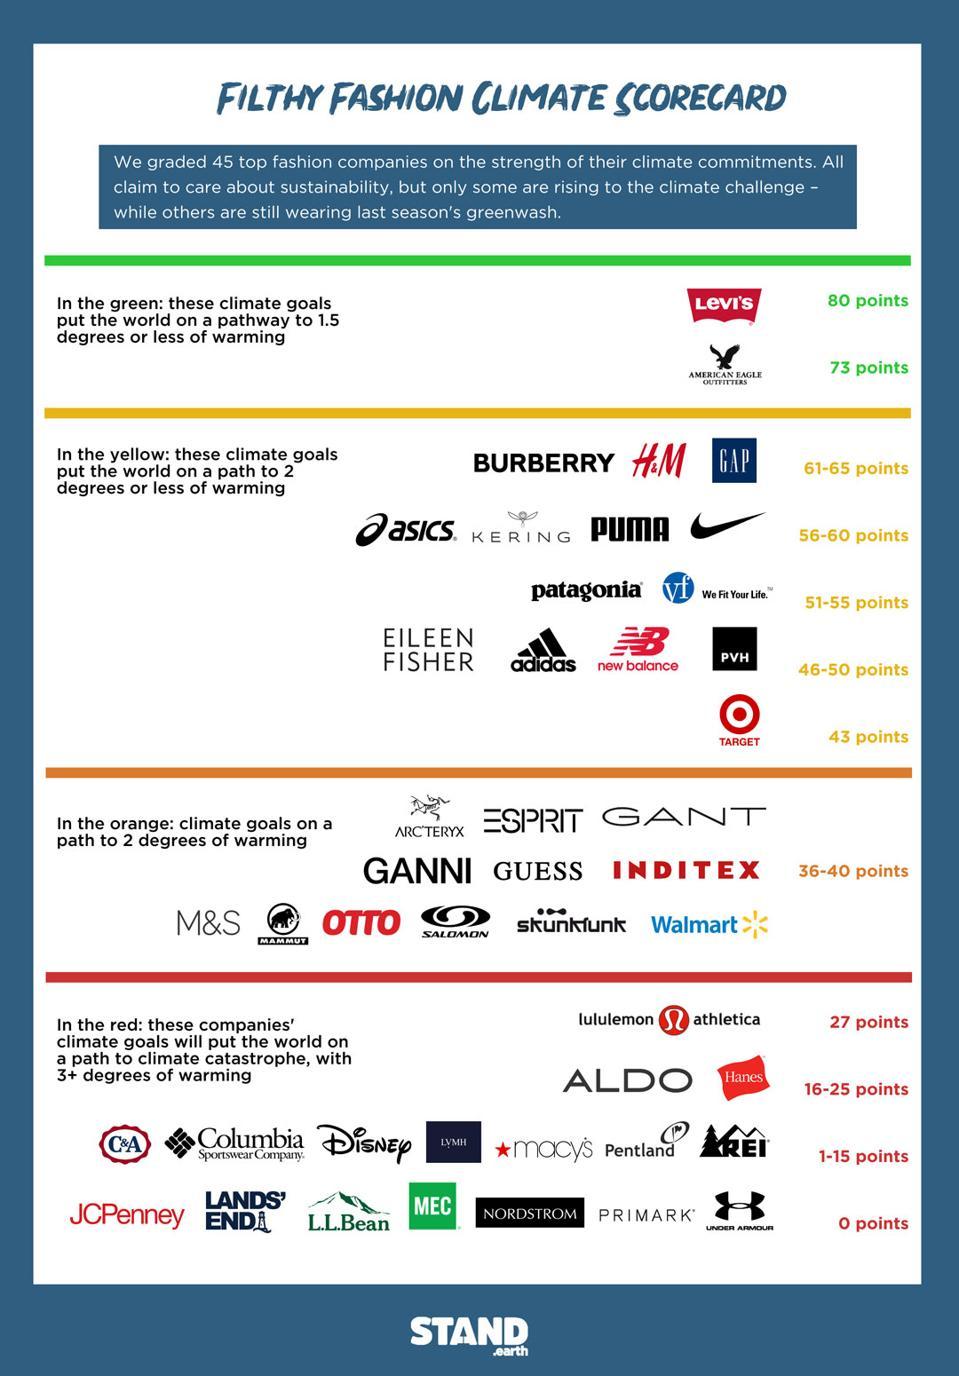 Filthy Fashion Climate Scorecard, Stand.Earth